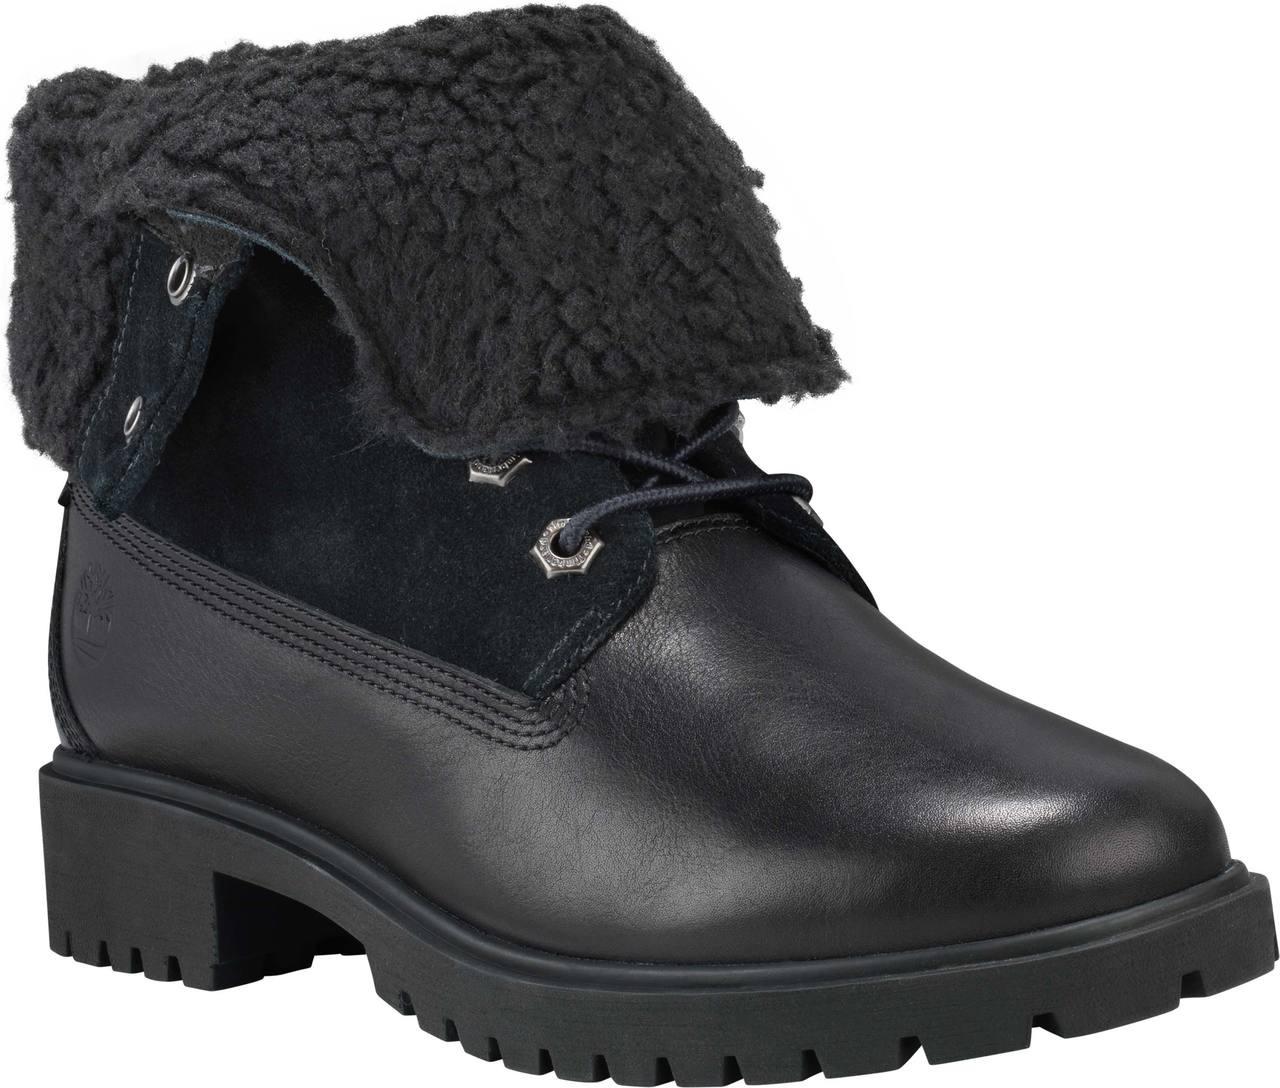 89d974cb0ba ... Boots  Timberland Women s Jayne Waterproof Fleece Fold-Down. Black  Full-Grain